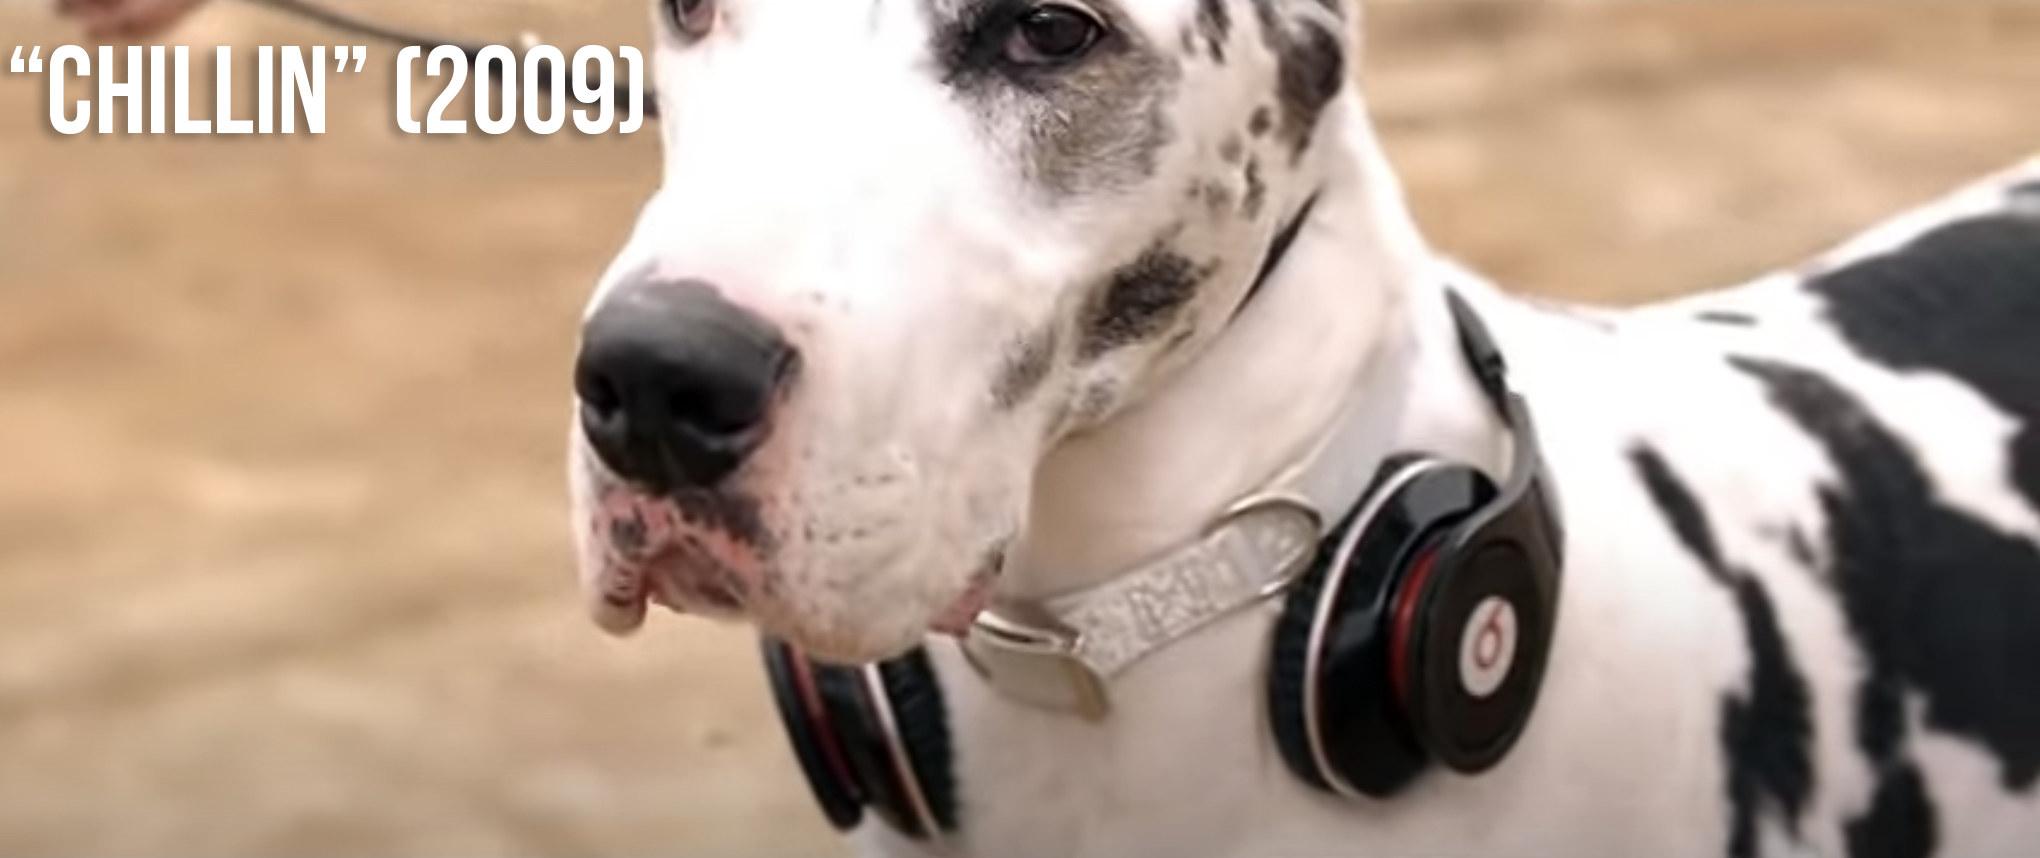 Either Lava or Rumpus wearing Beats headphones around their neck